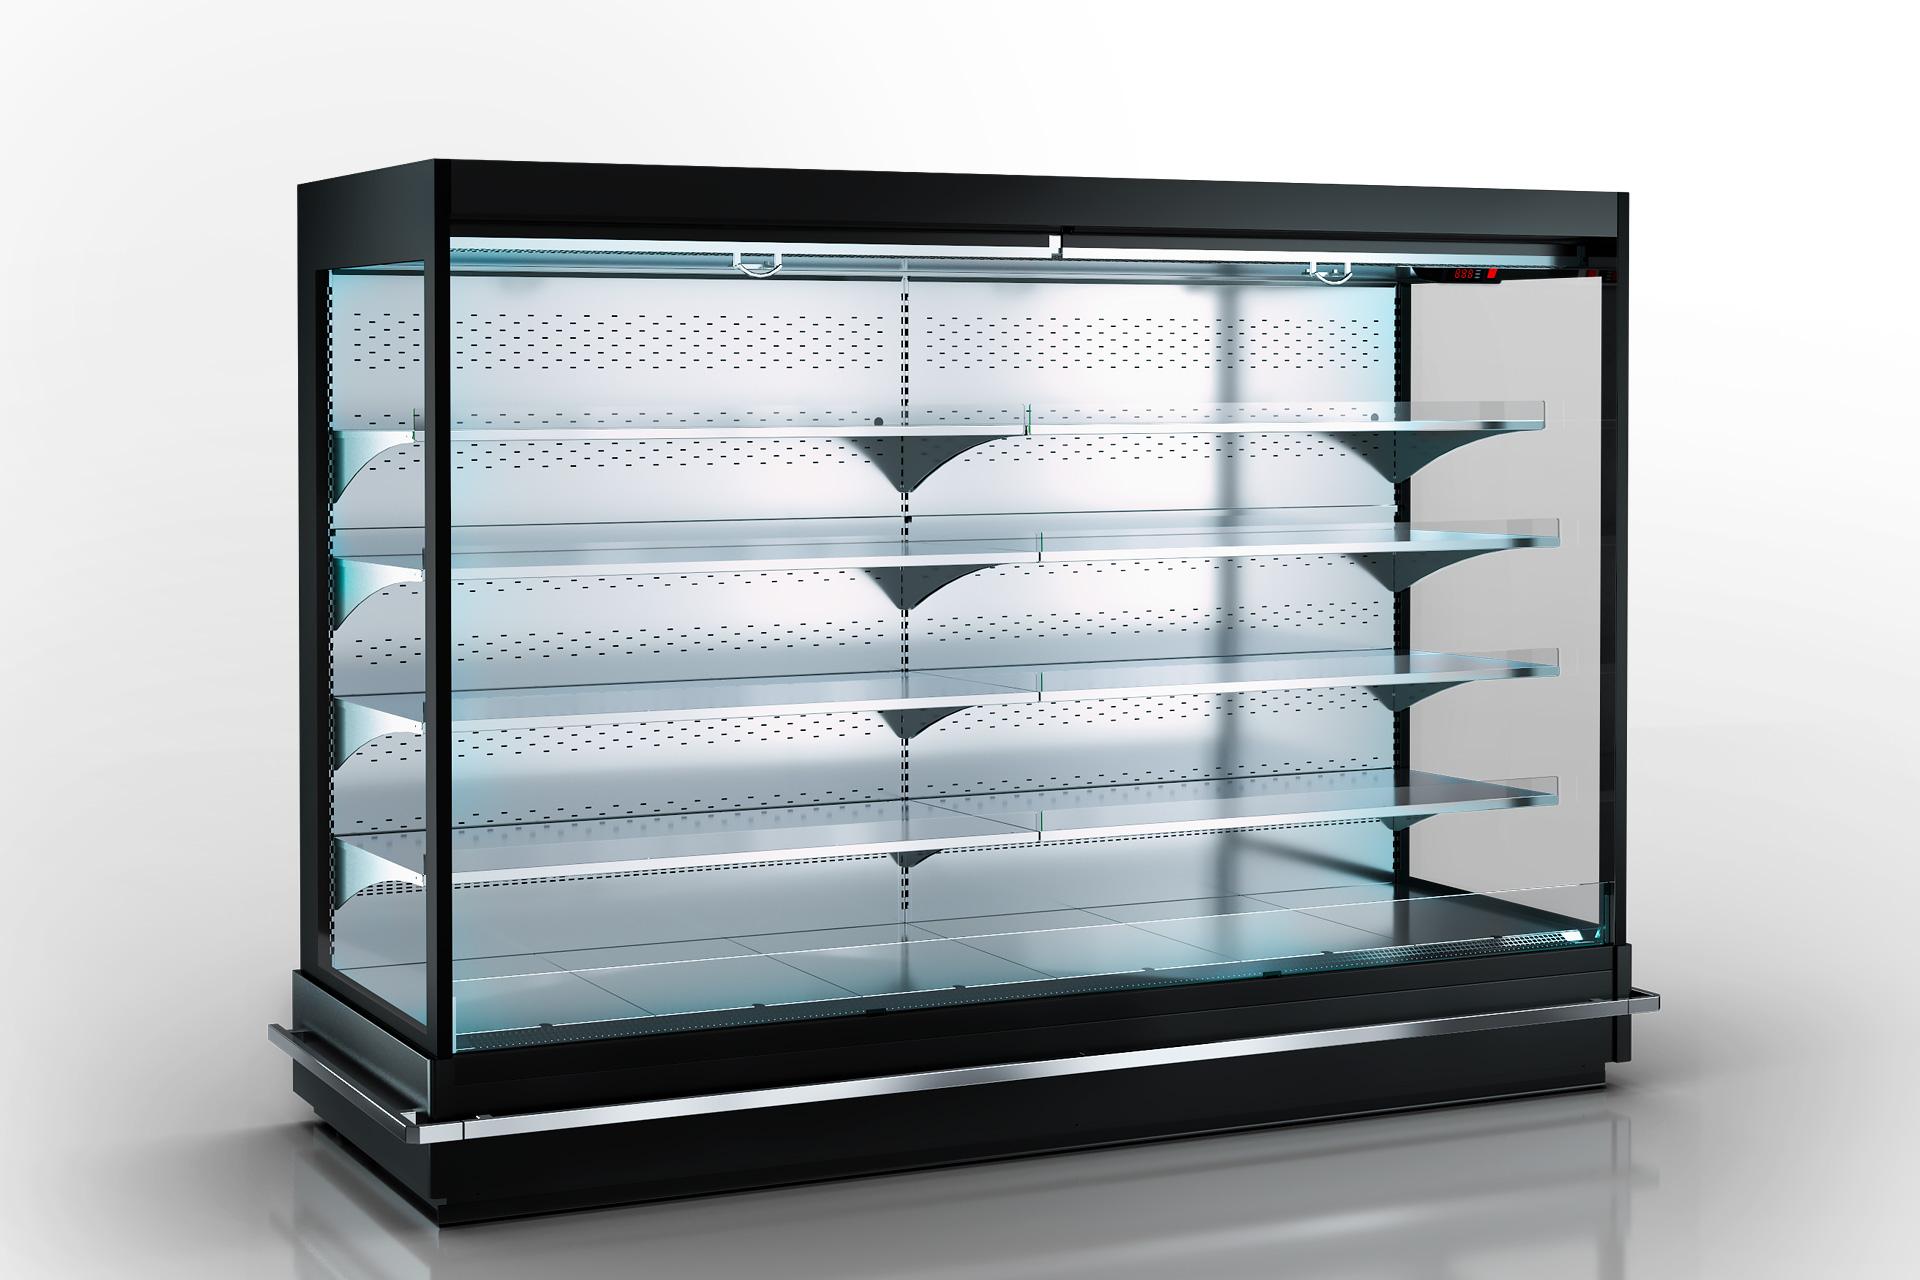 Refrigerated multideck cabinets Indiana MV 090 MT O 185-DLM